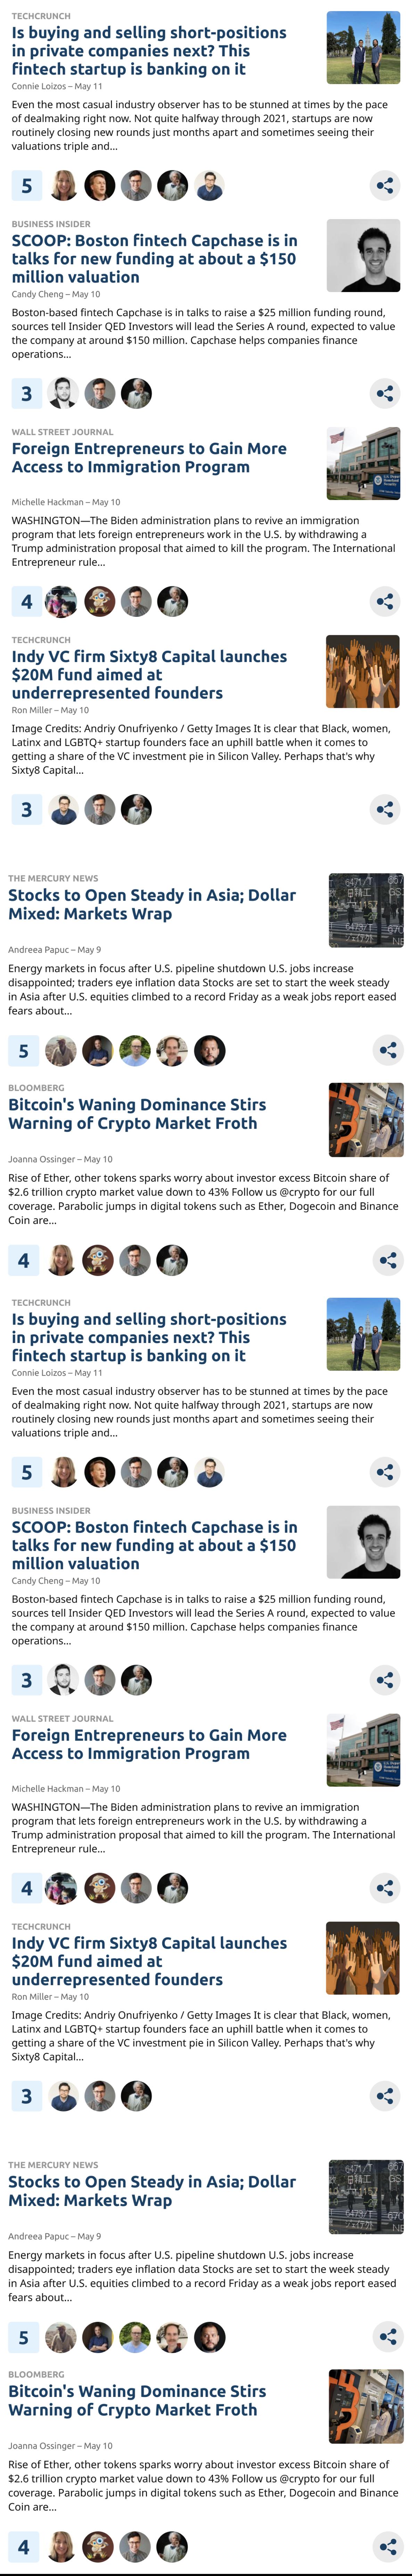 social news feed